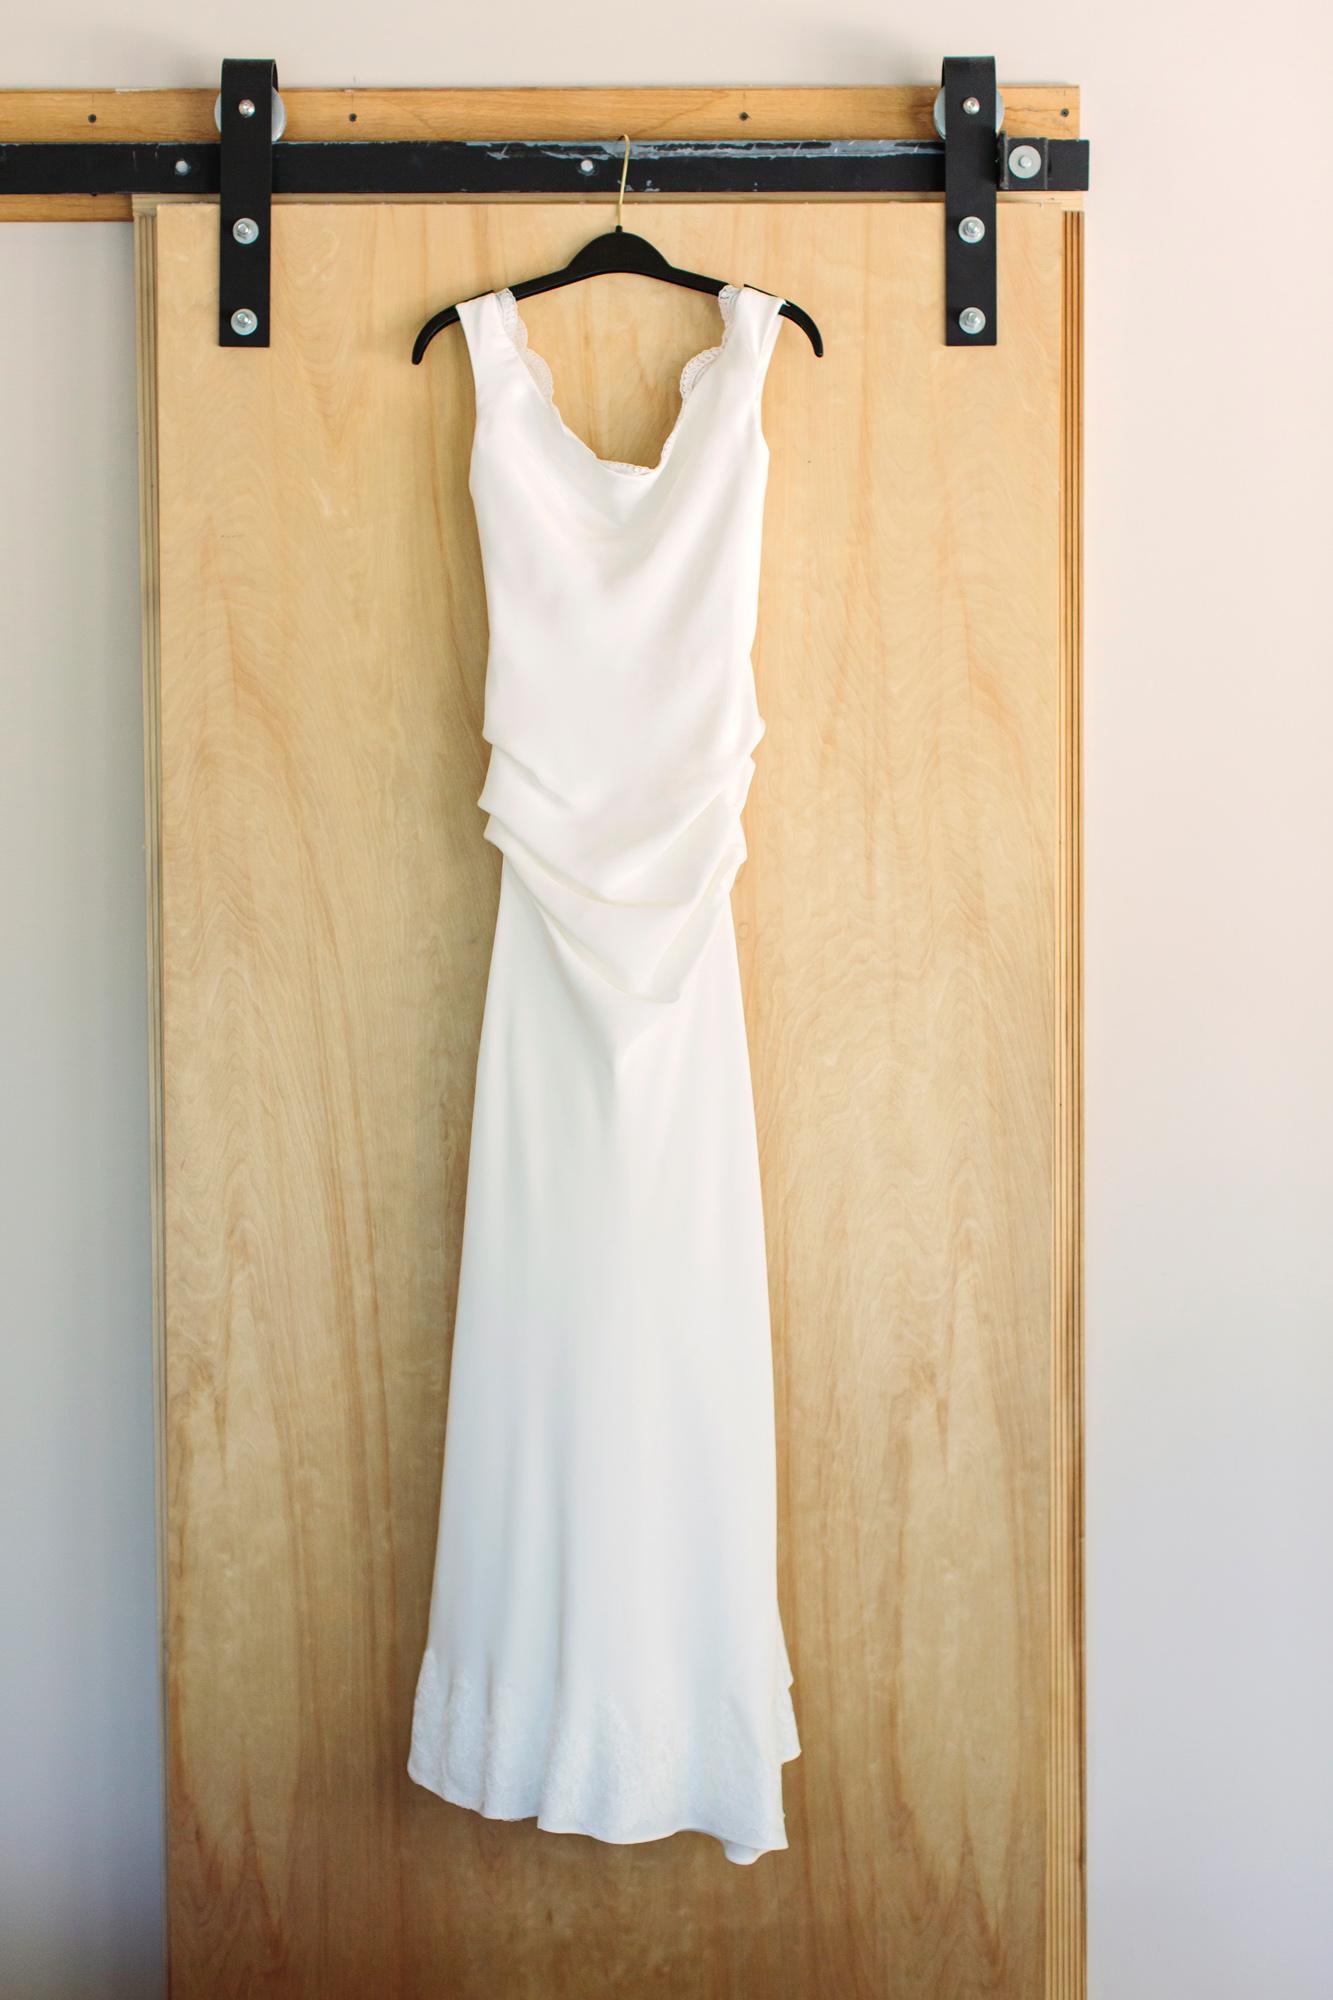 05_Rowan_Brian_The_Roundhouse_Wedding_Beacon_NY_Tanya_Salazar_Photography_1046.jpg